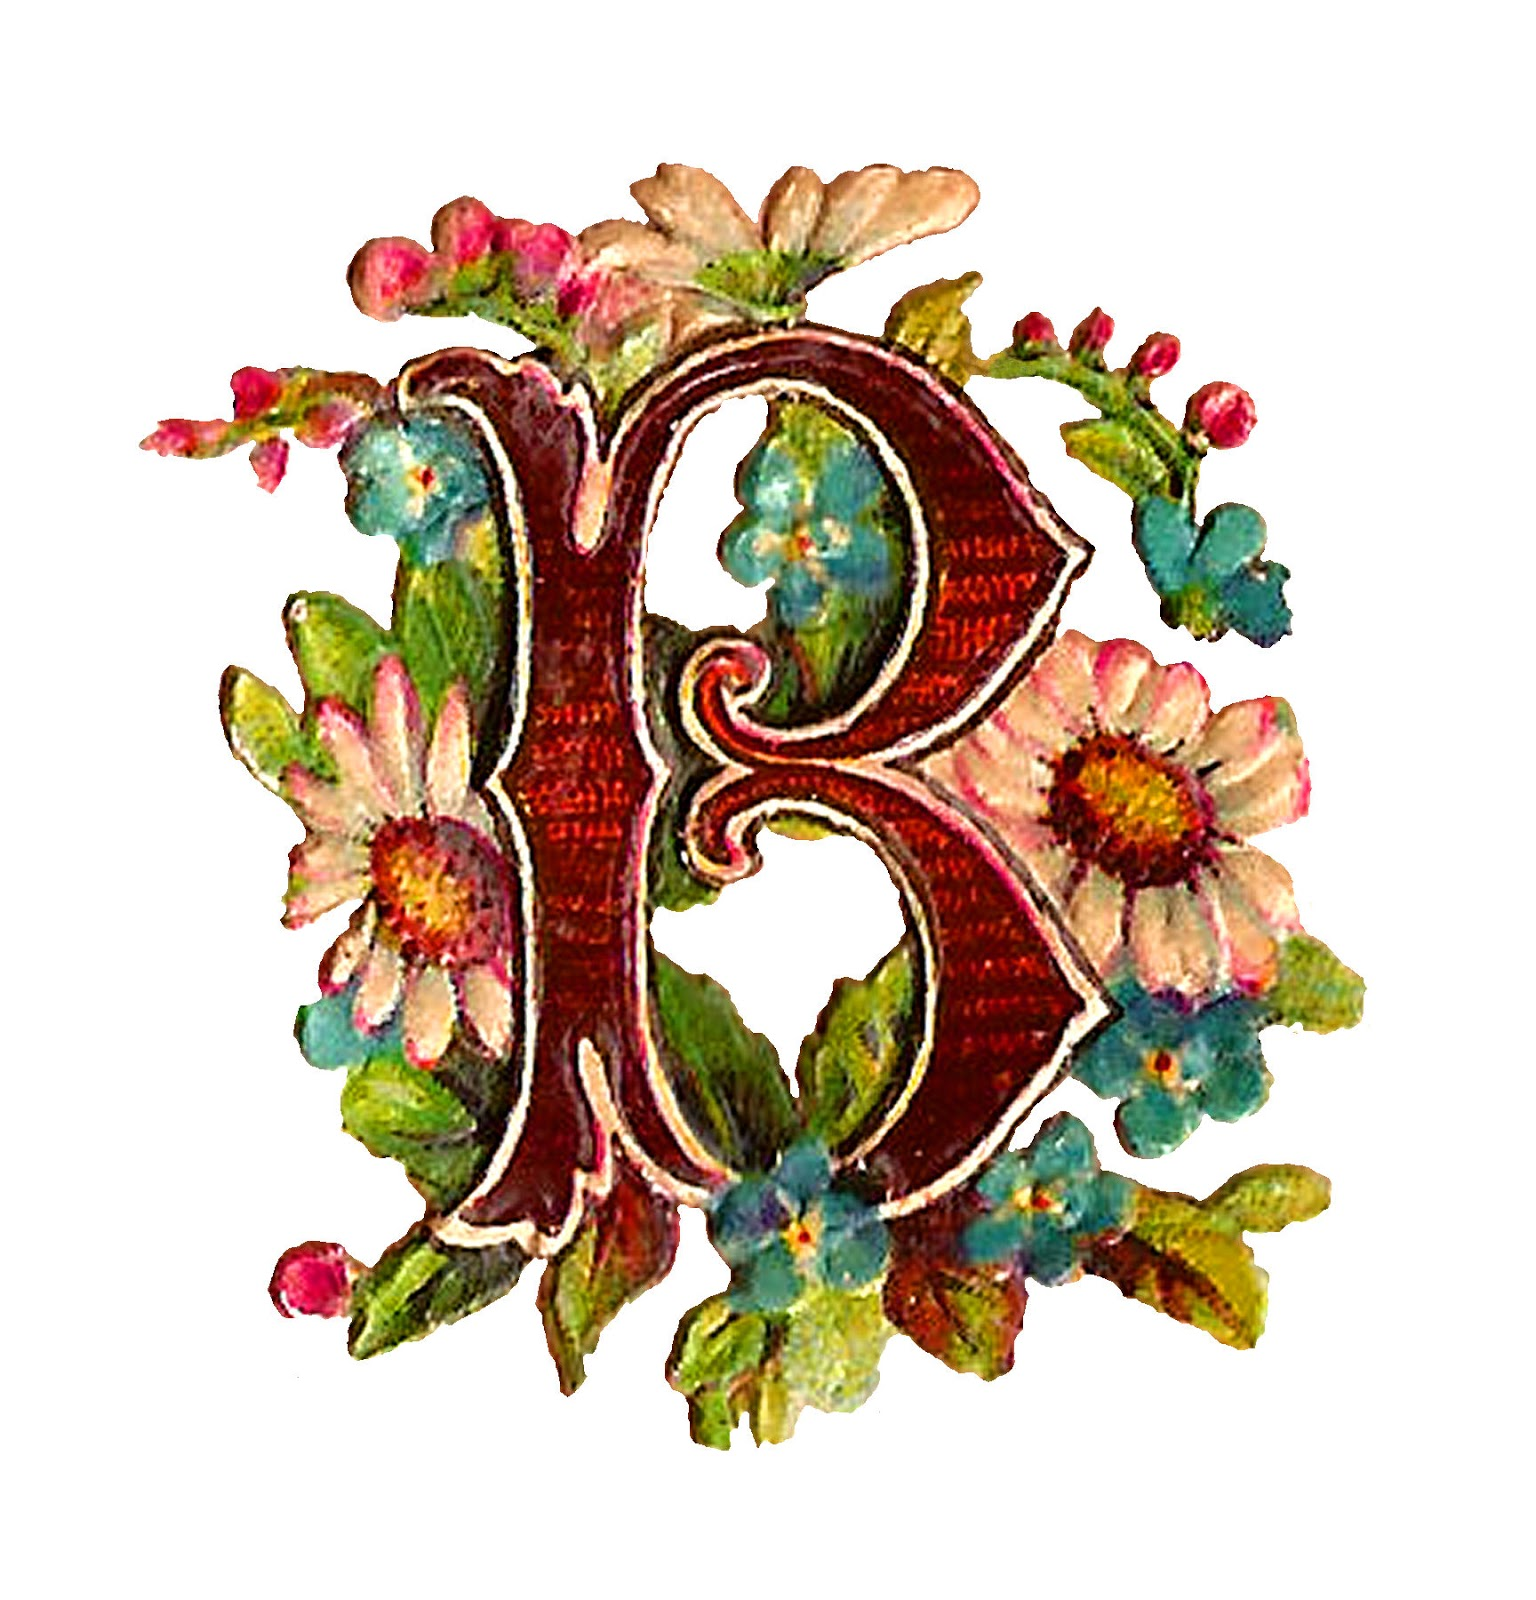 hight resolution of drop cap letter image crafting clipart floral design digital download